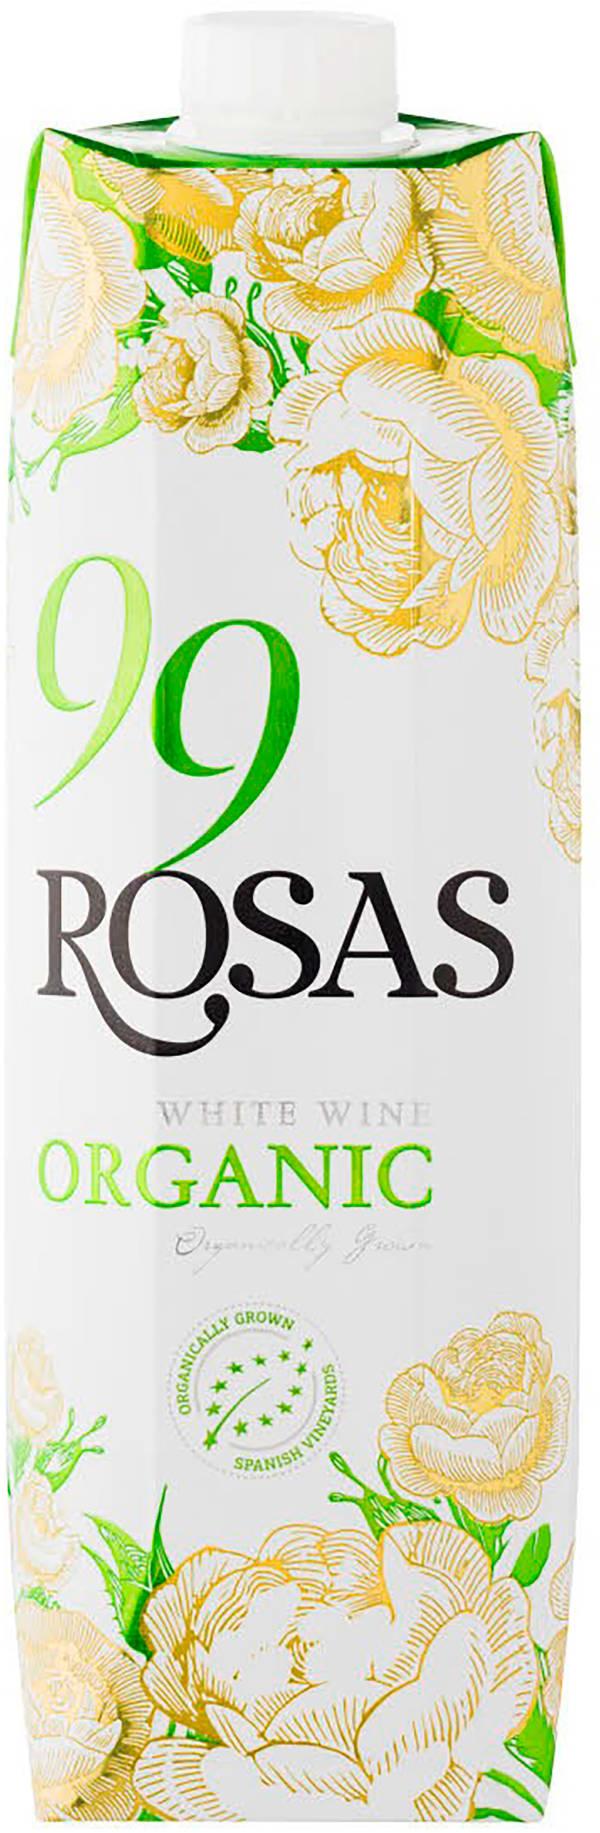 99 Rosas Organic White Wine 2019 kartongförpackning